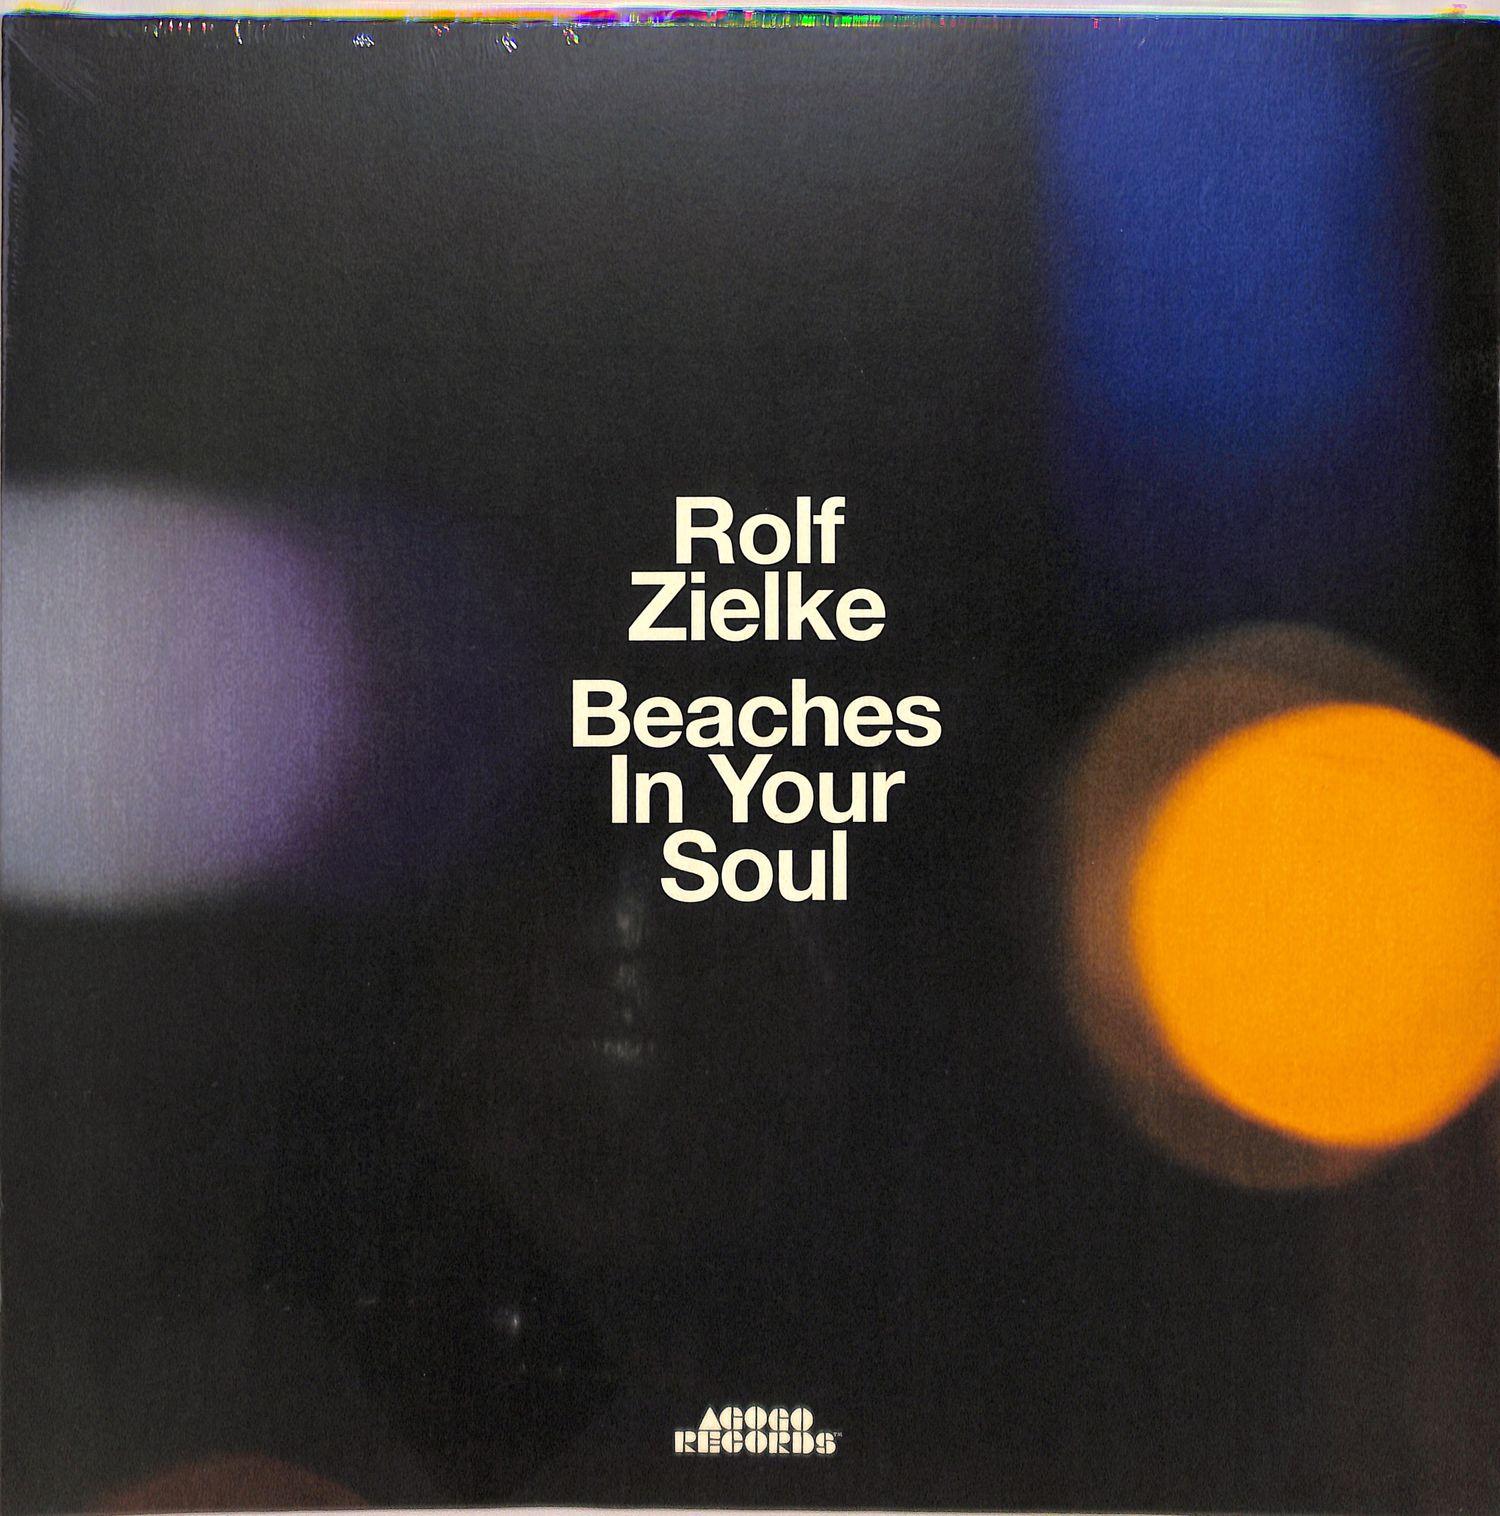 Rolf Zielke - BEACHES IN YOUR SOUL